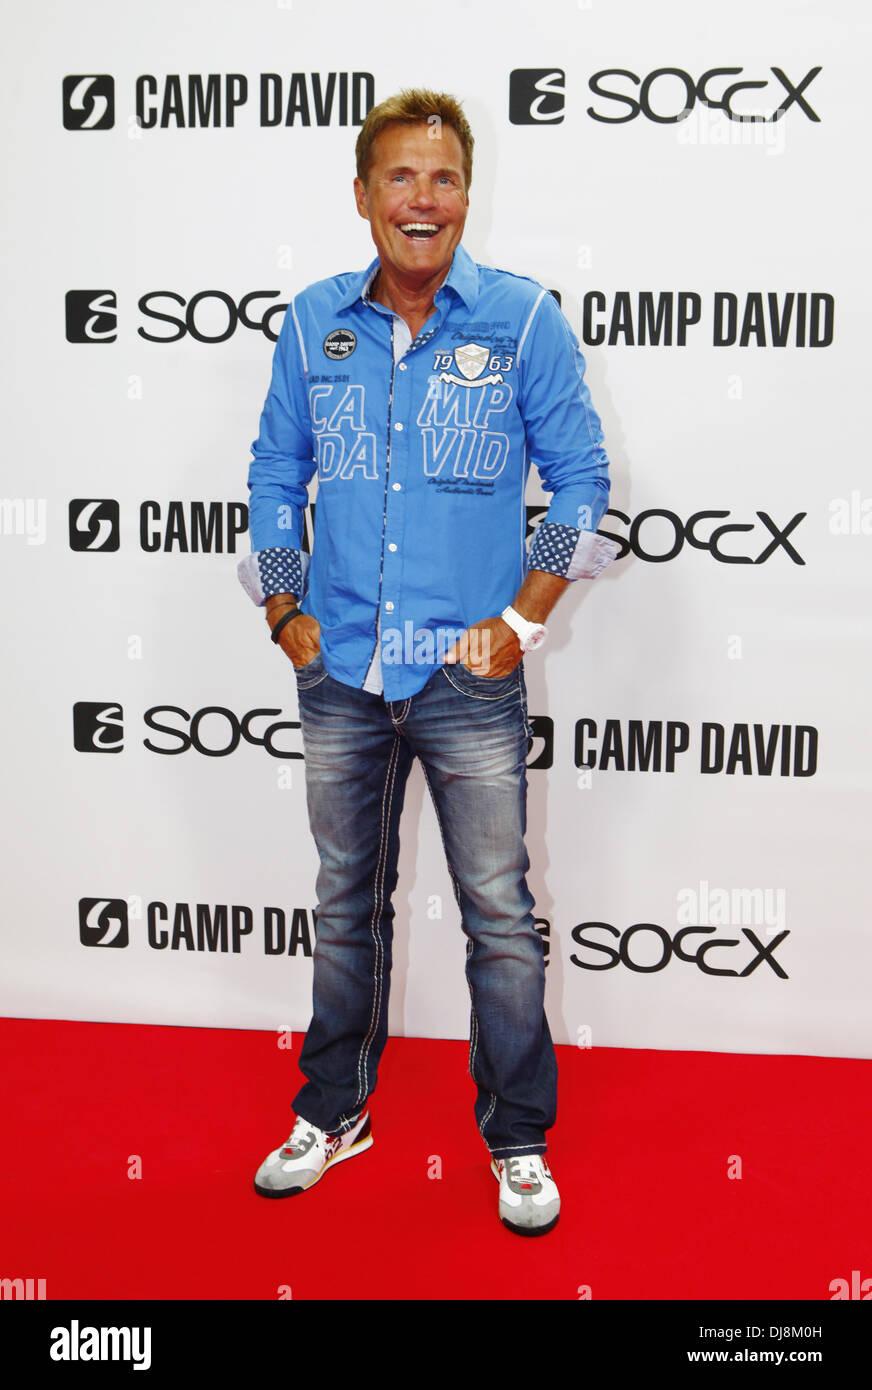 Dieter Bohlen at the Camp DavidSoccx fashion show during